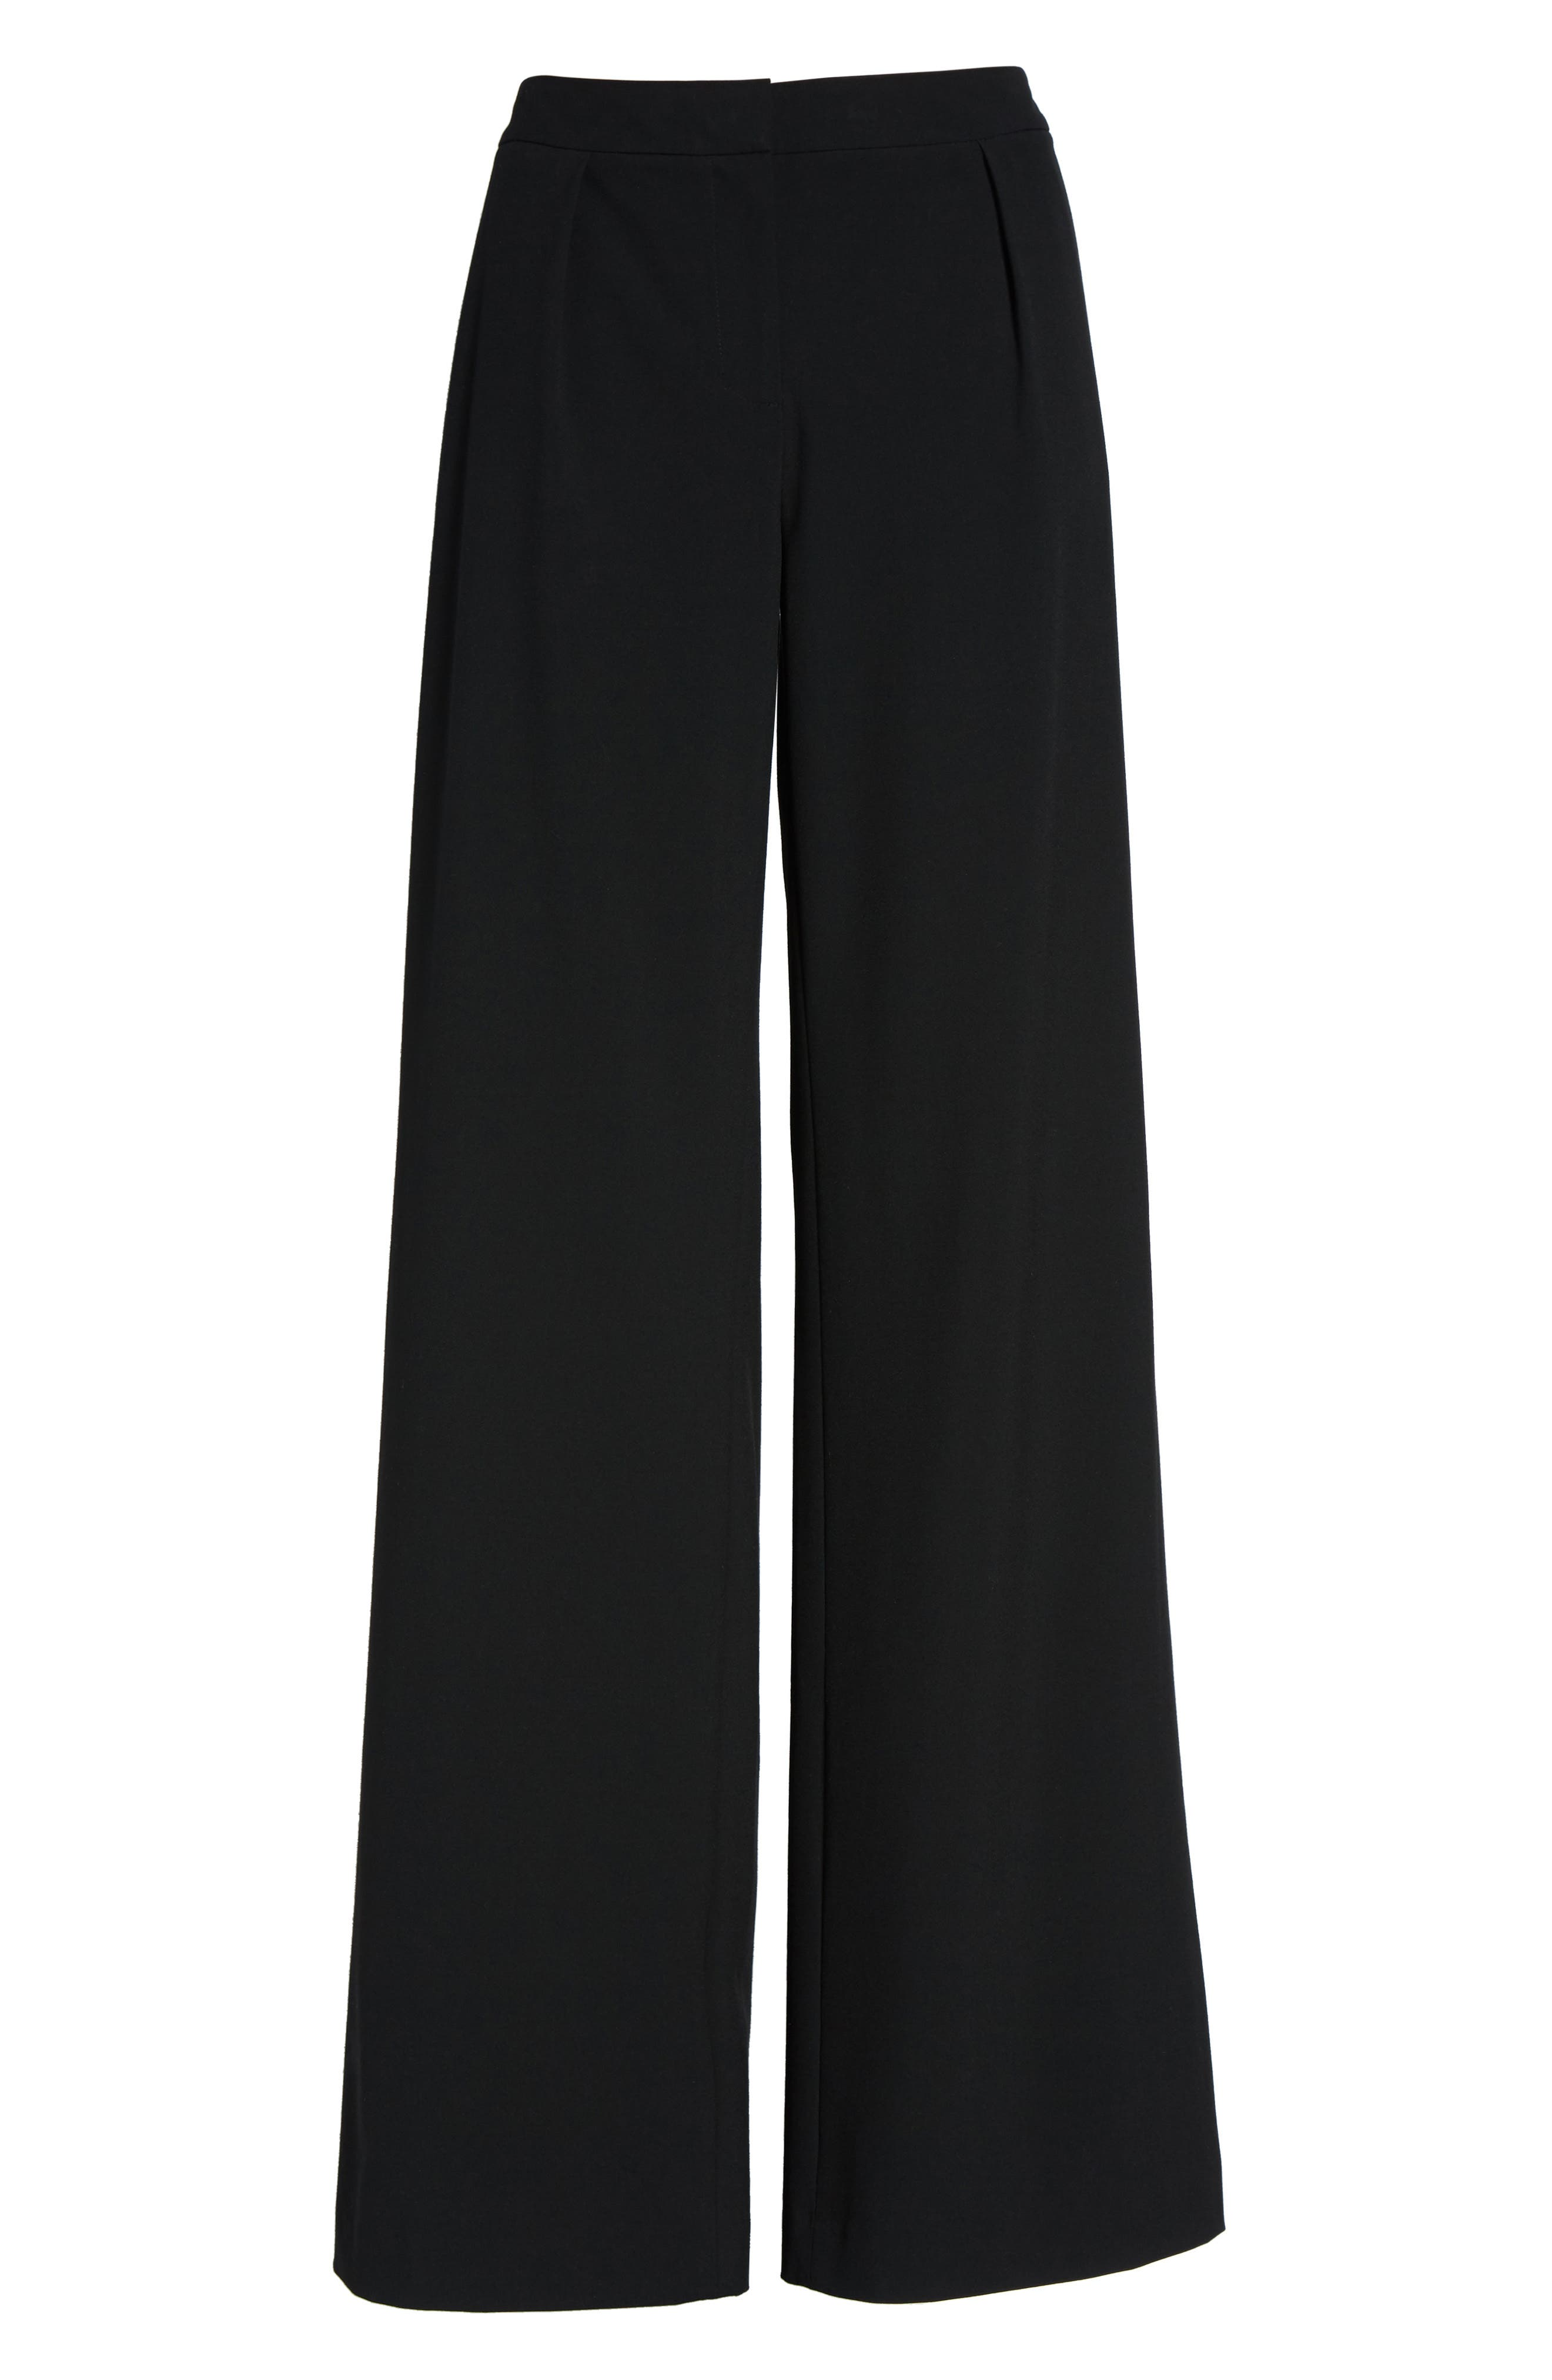 High Waist Wide Leg Pants,                             Alternate thumbnail 6, color,                             001